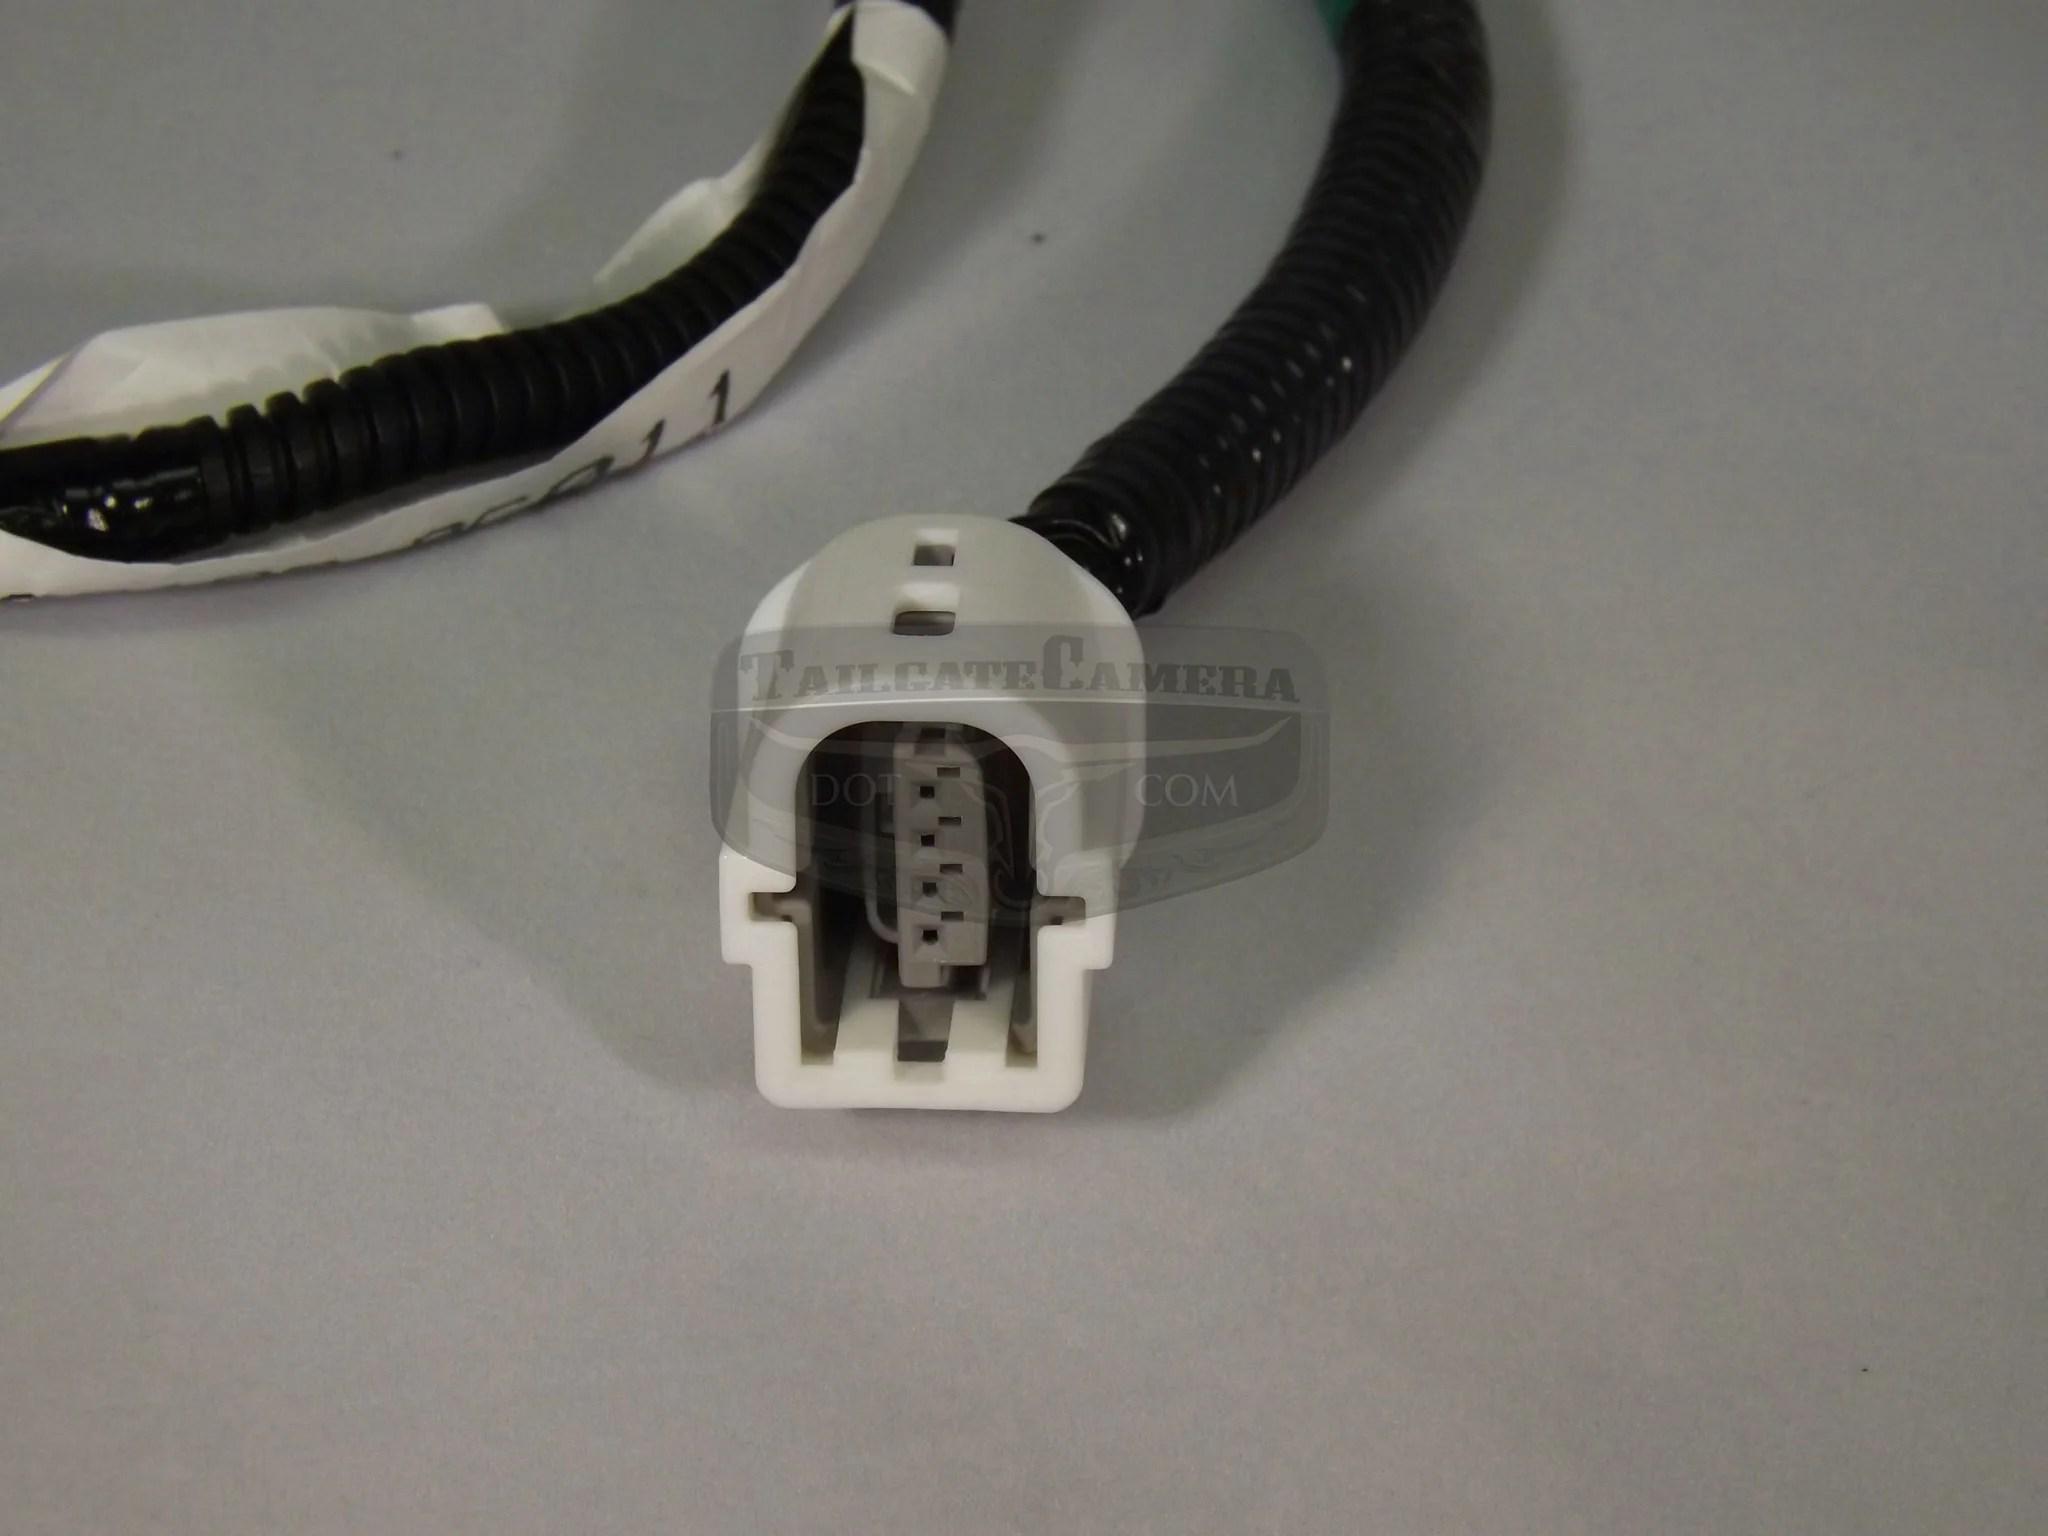 hight resolution of backup camera wiring harness wiring diagram post reverse camera wiring harness 2010 2013 tundra hd camera